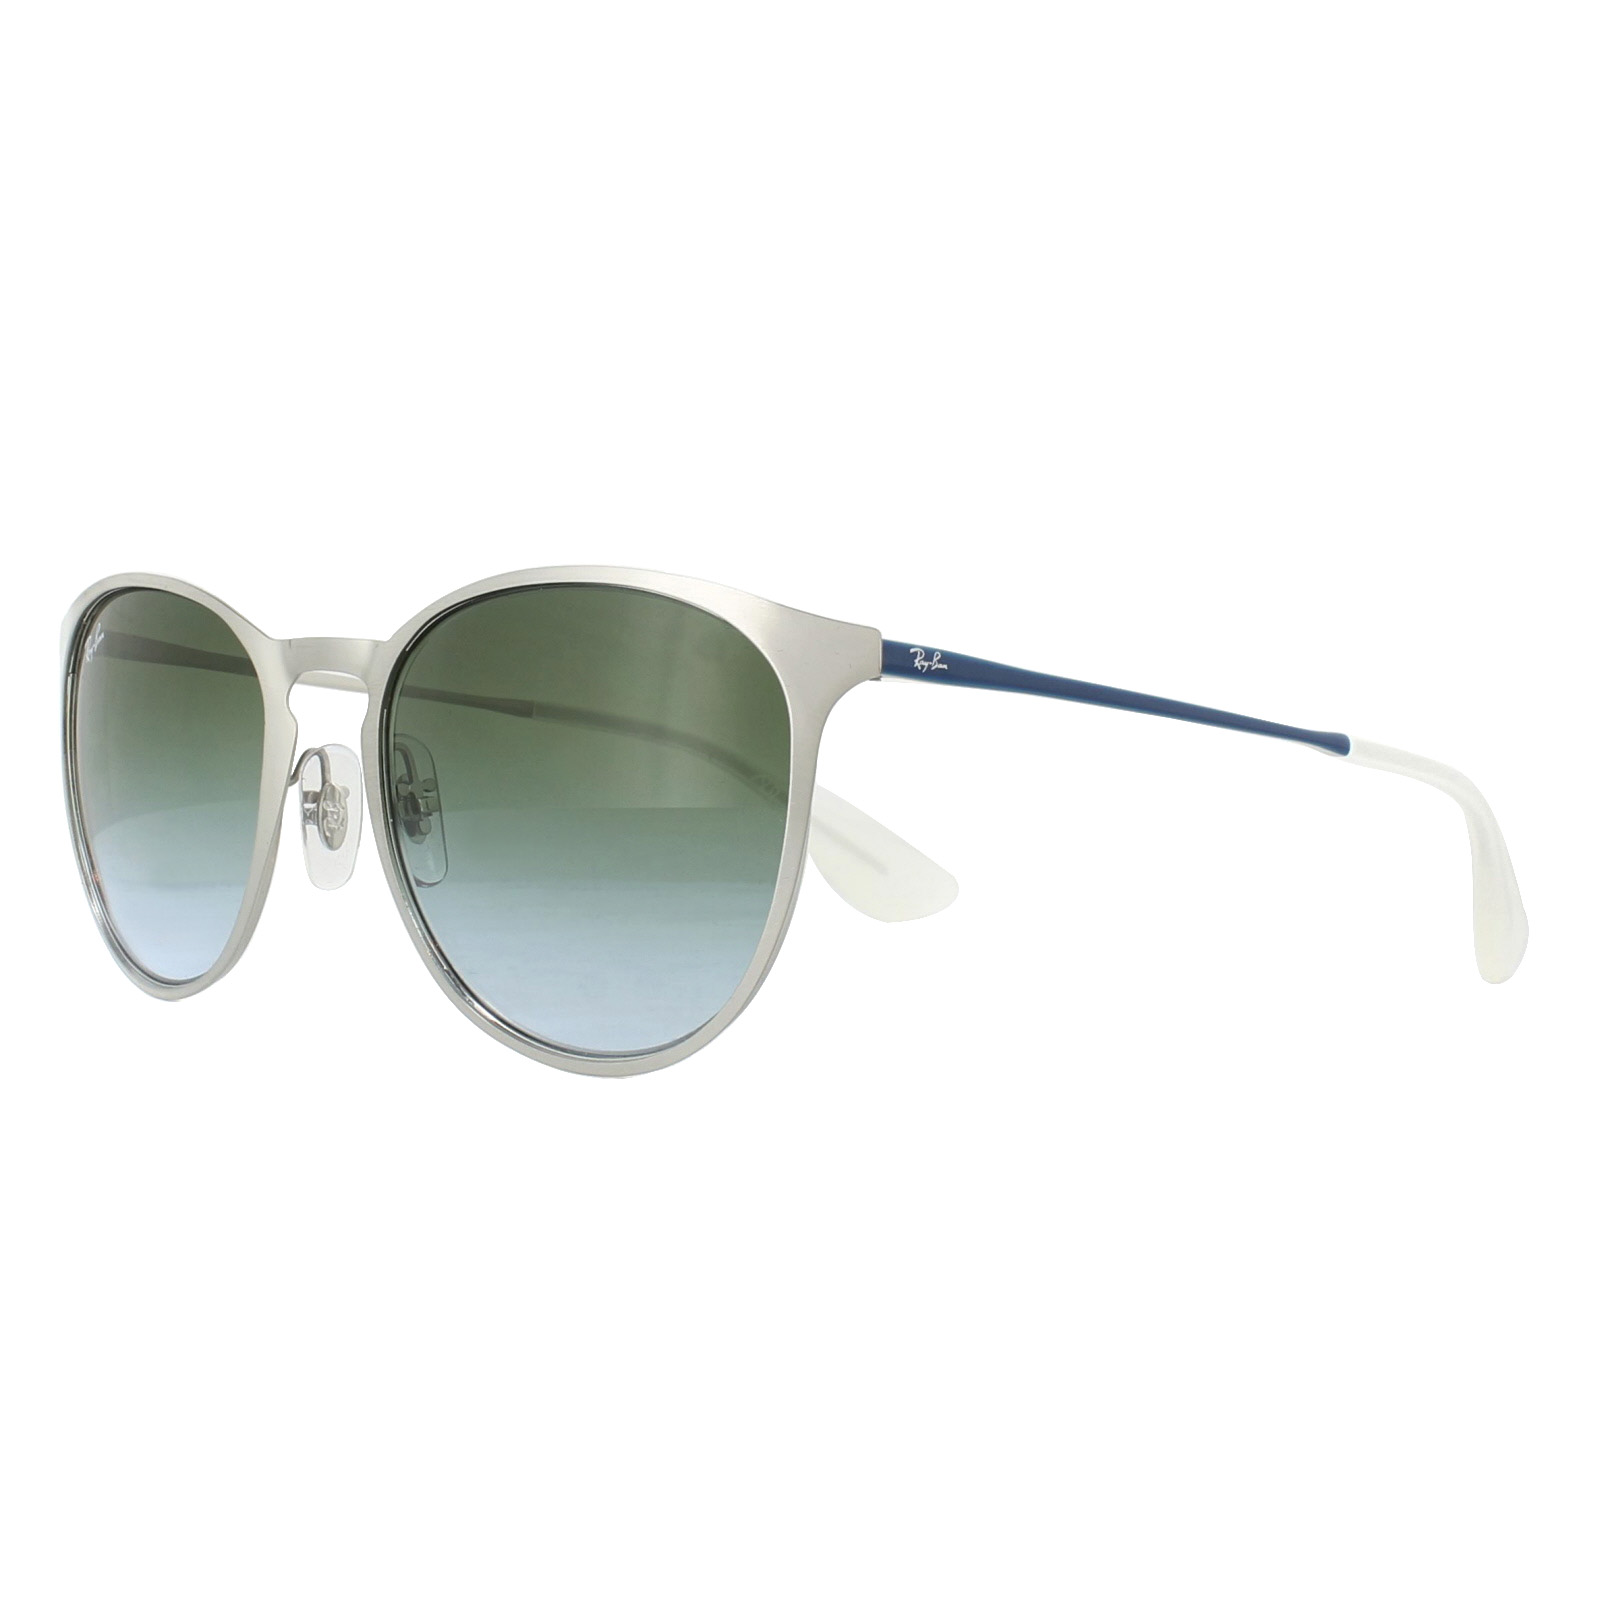 b6fd2735433 Sentinel Ray-Ban Sunglasses Erika Metal 3539 9080I7 Silver Blue Green  Gradient